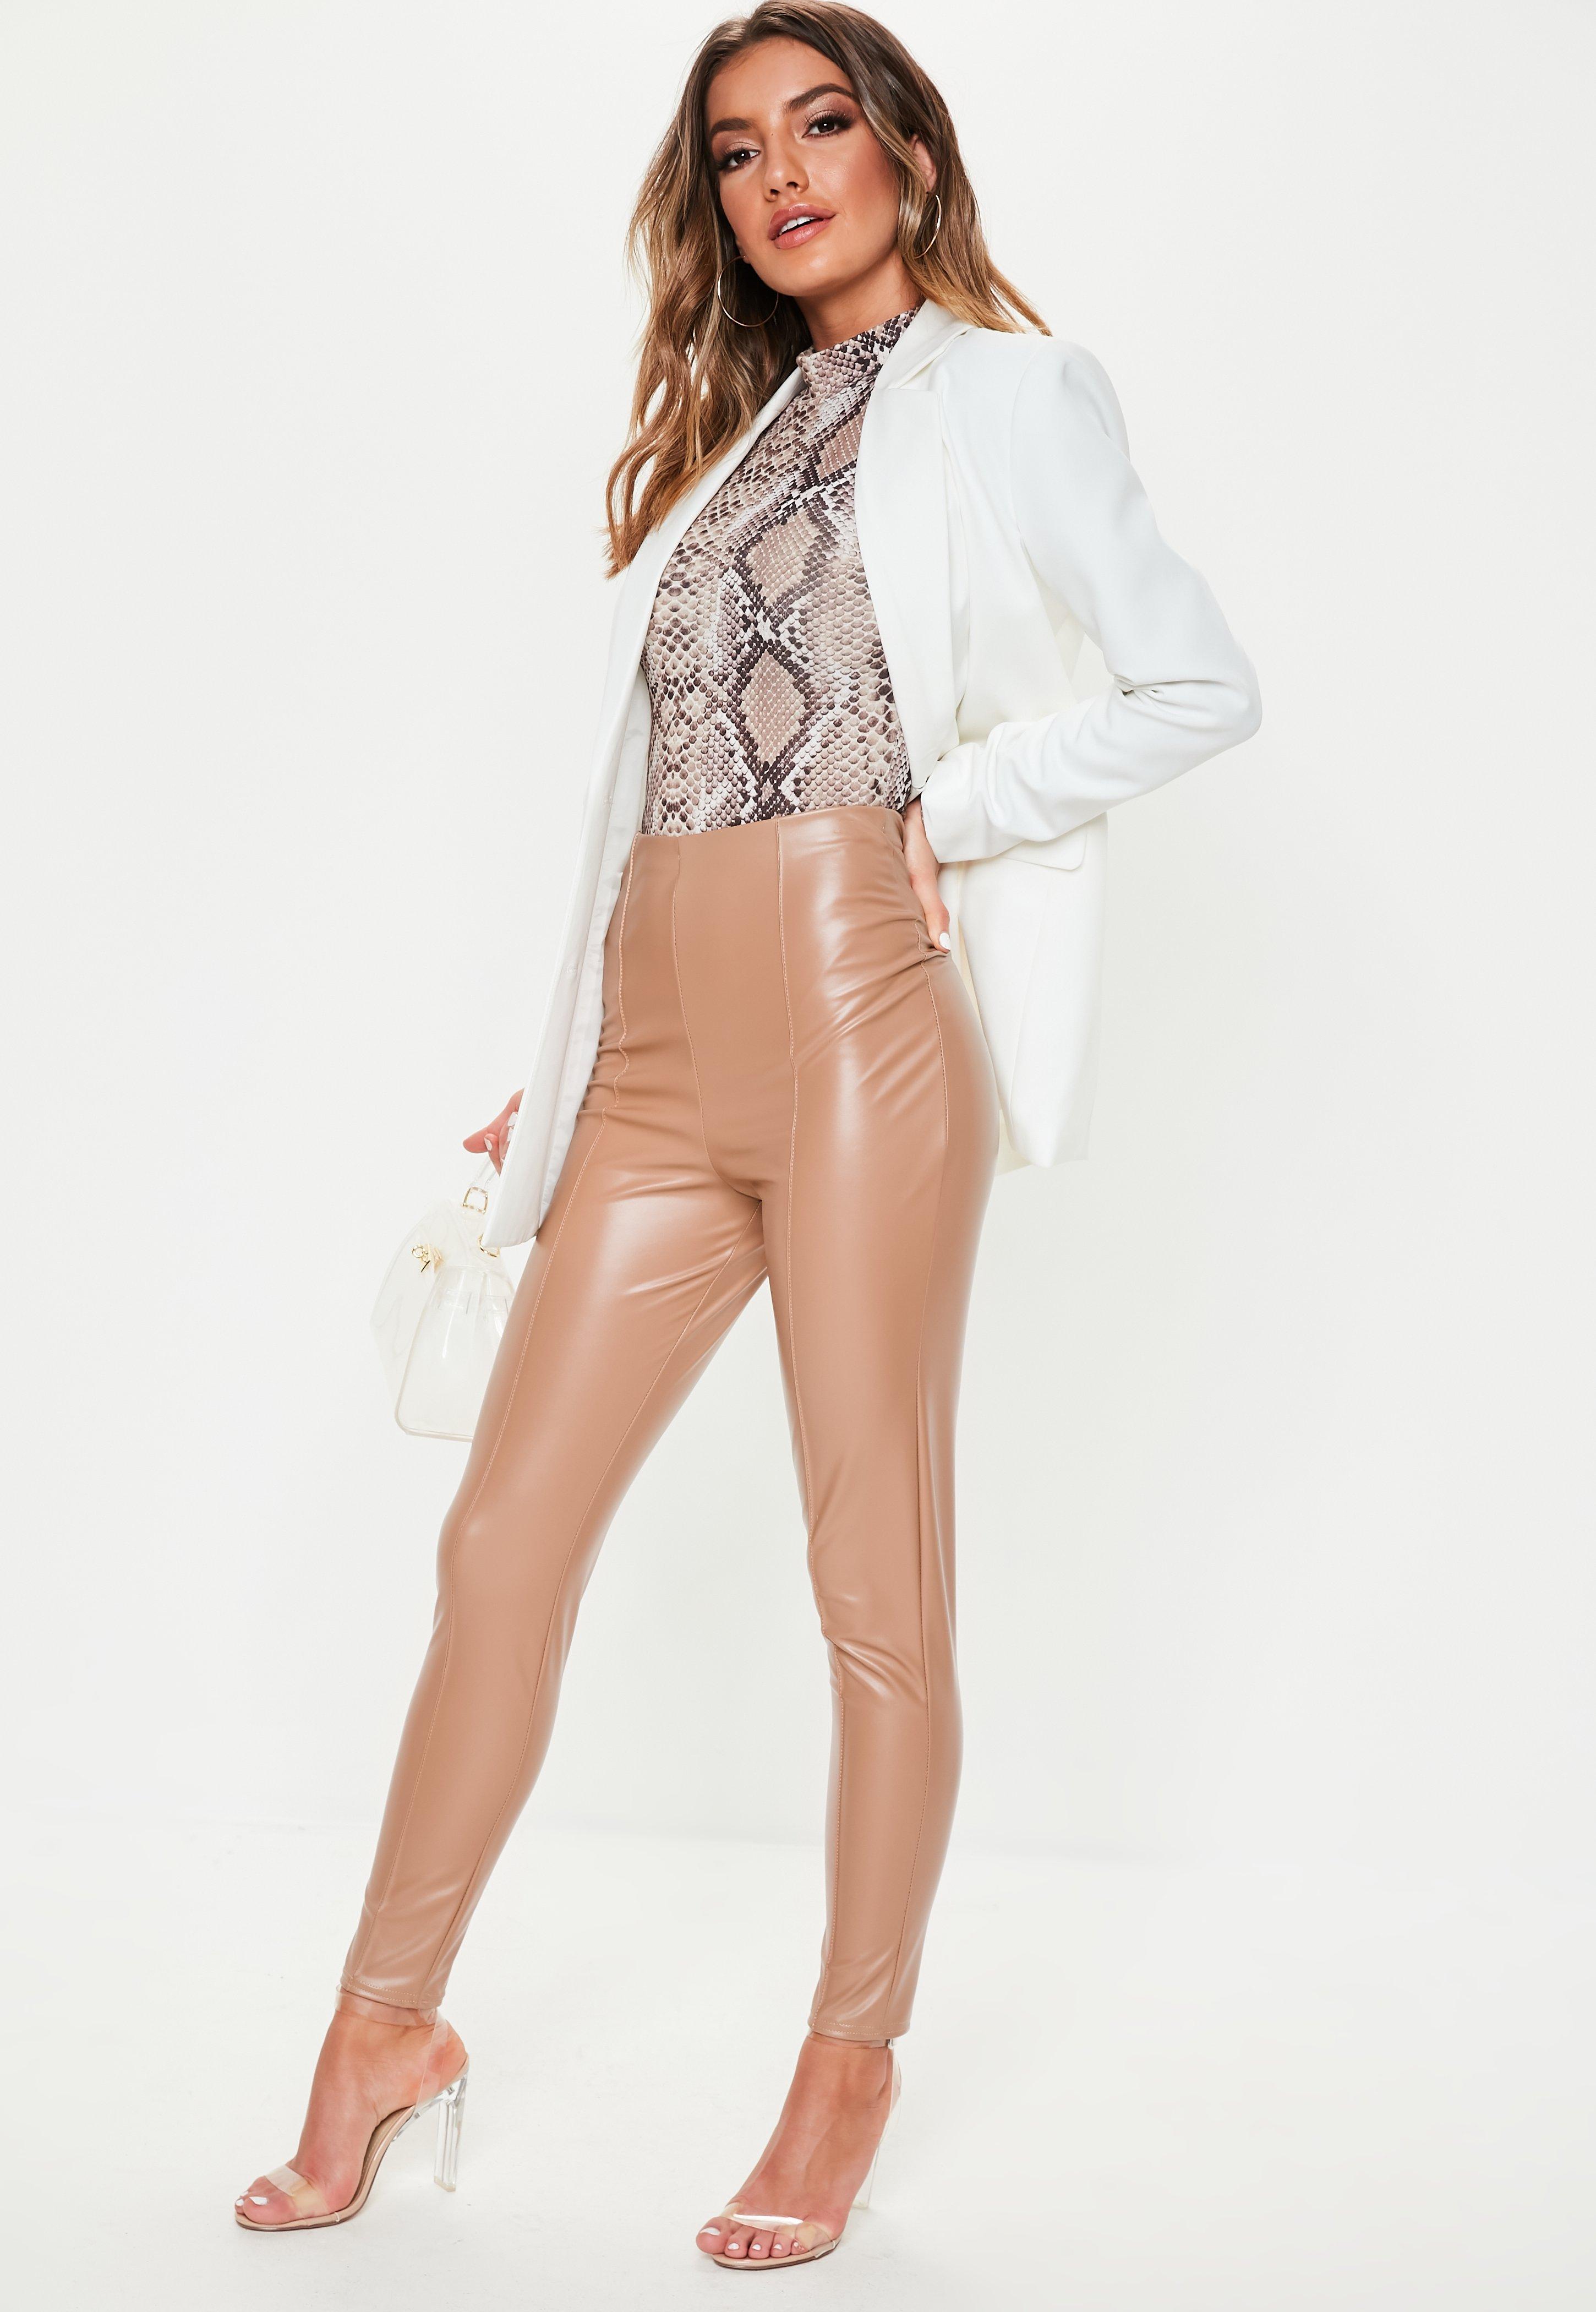 baa56d7f03f6e Leggings | Black, Wet Look & Leather Leggings - Missguided IE